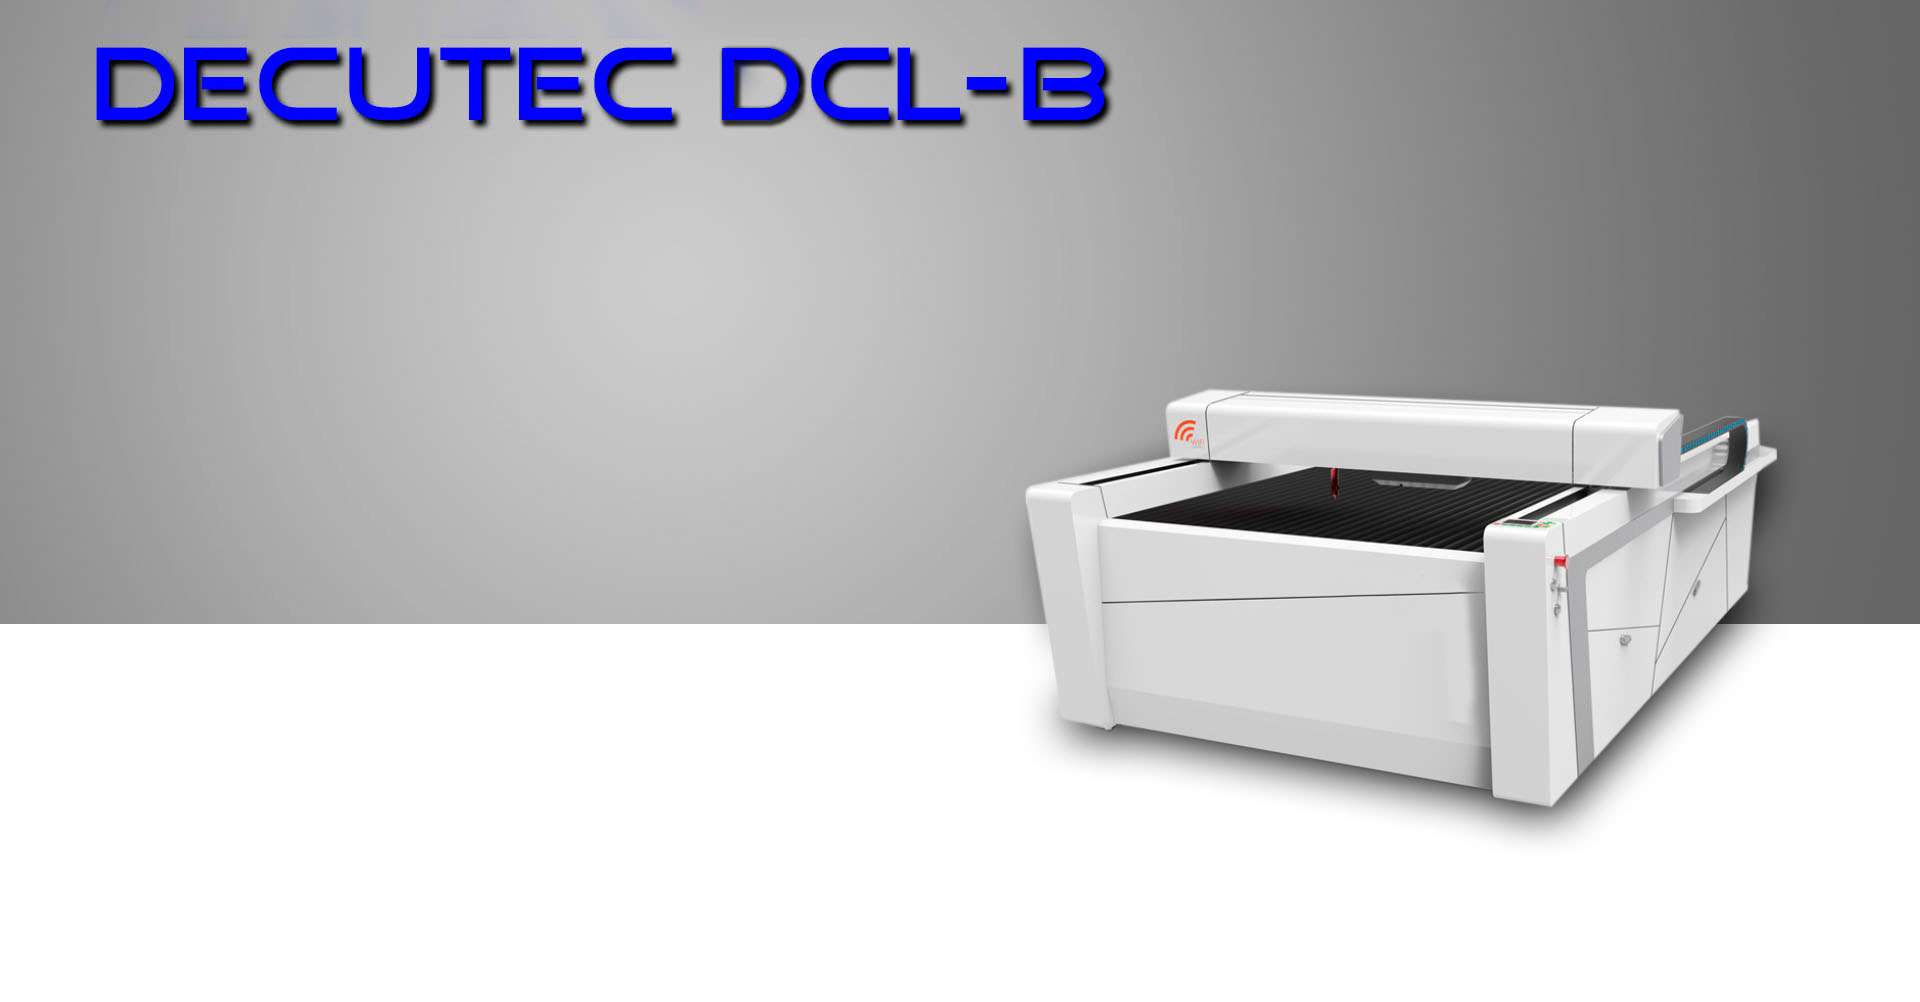 corte laser BCL-B euracryl wifi